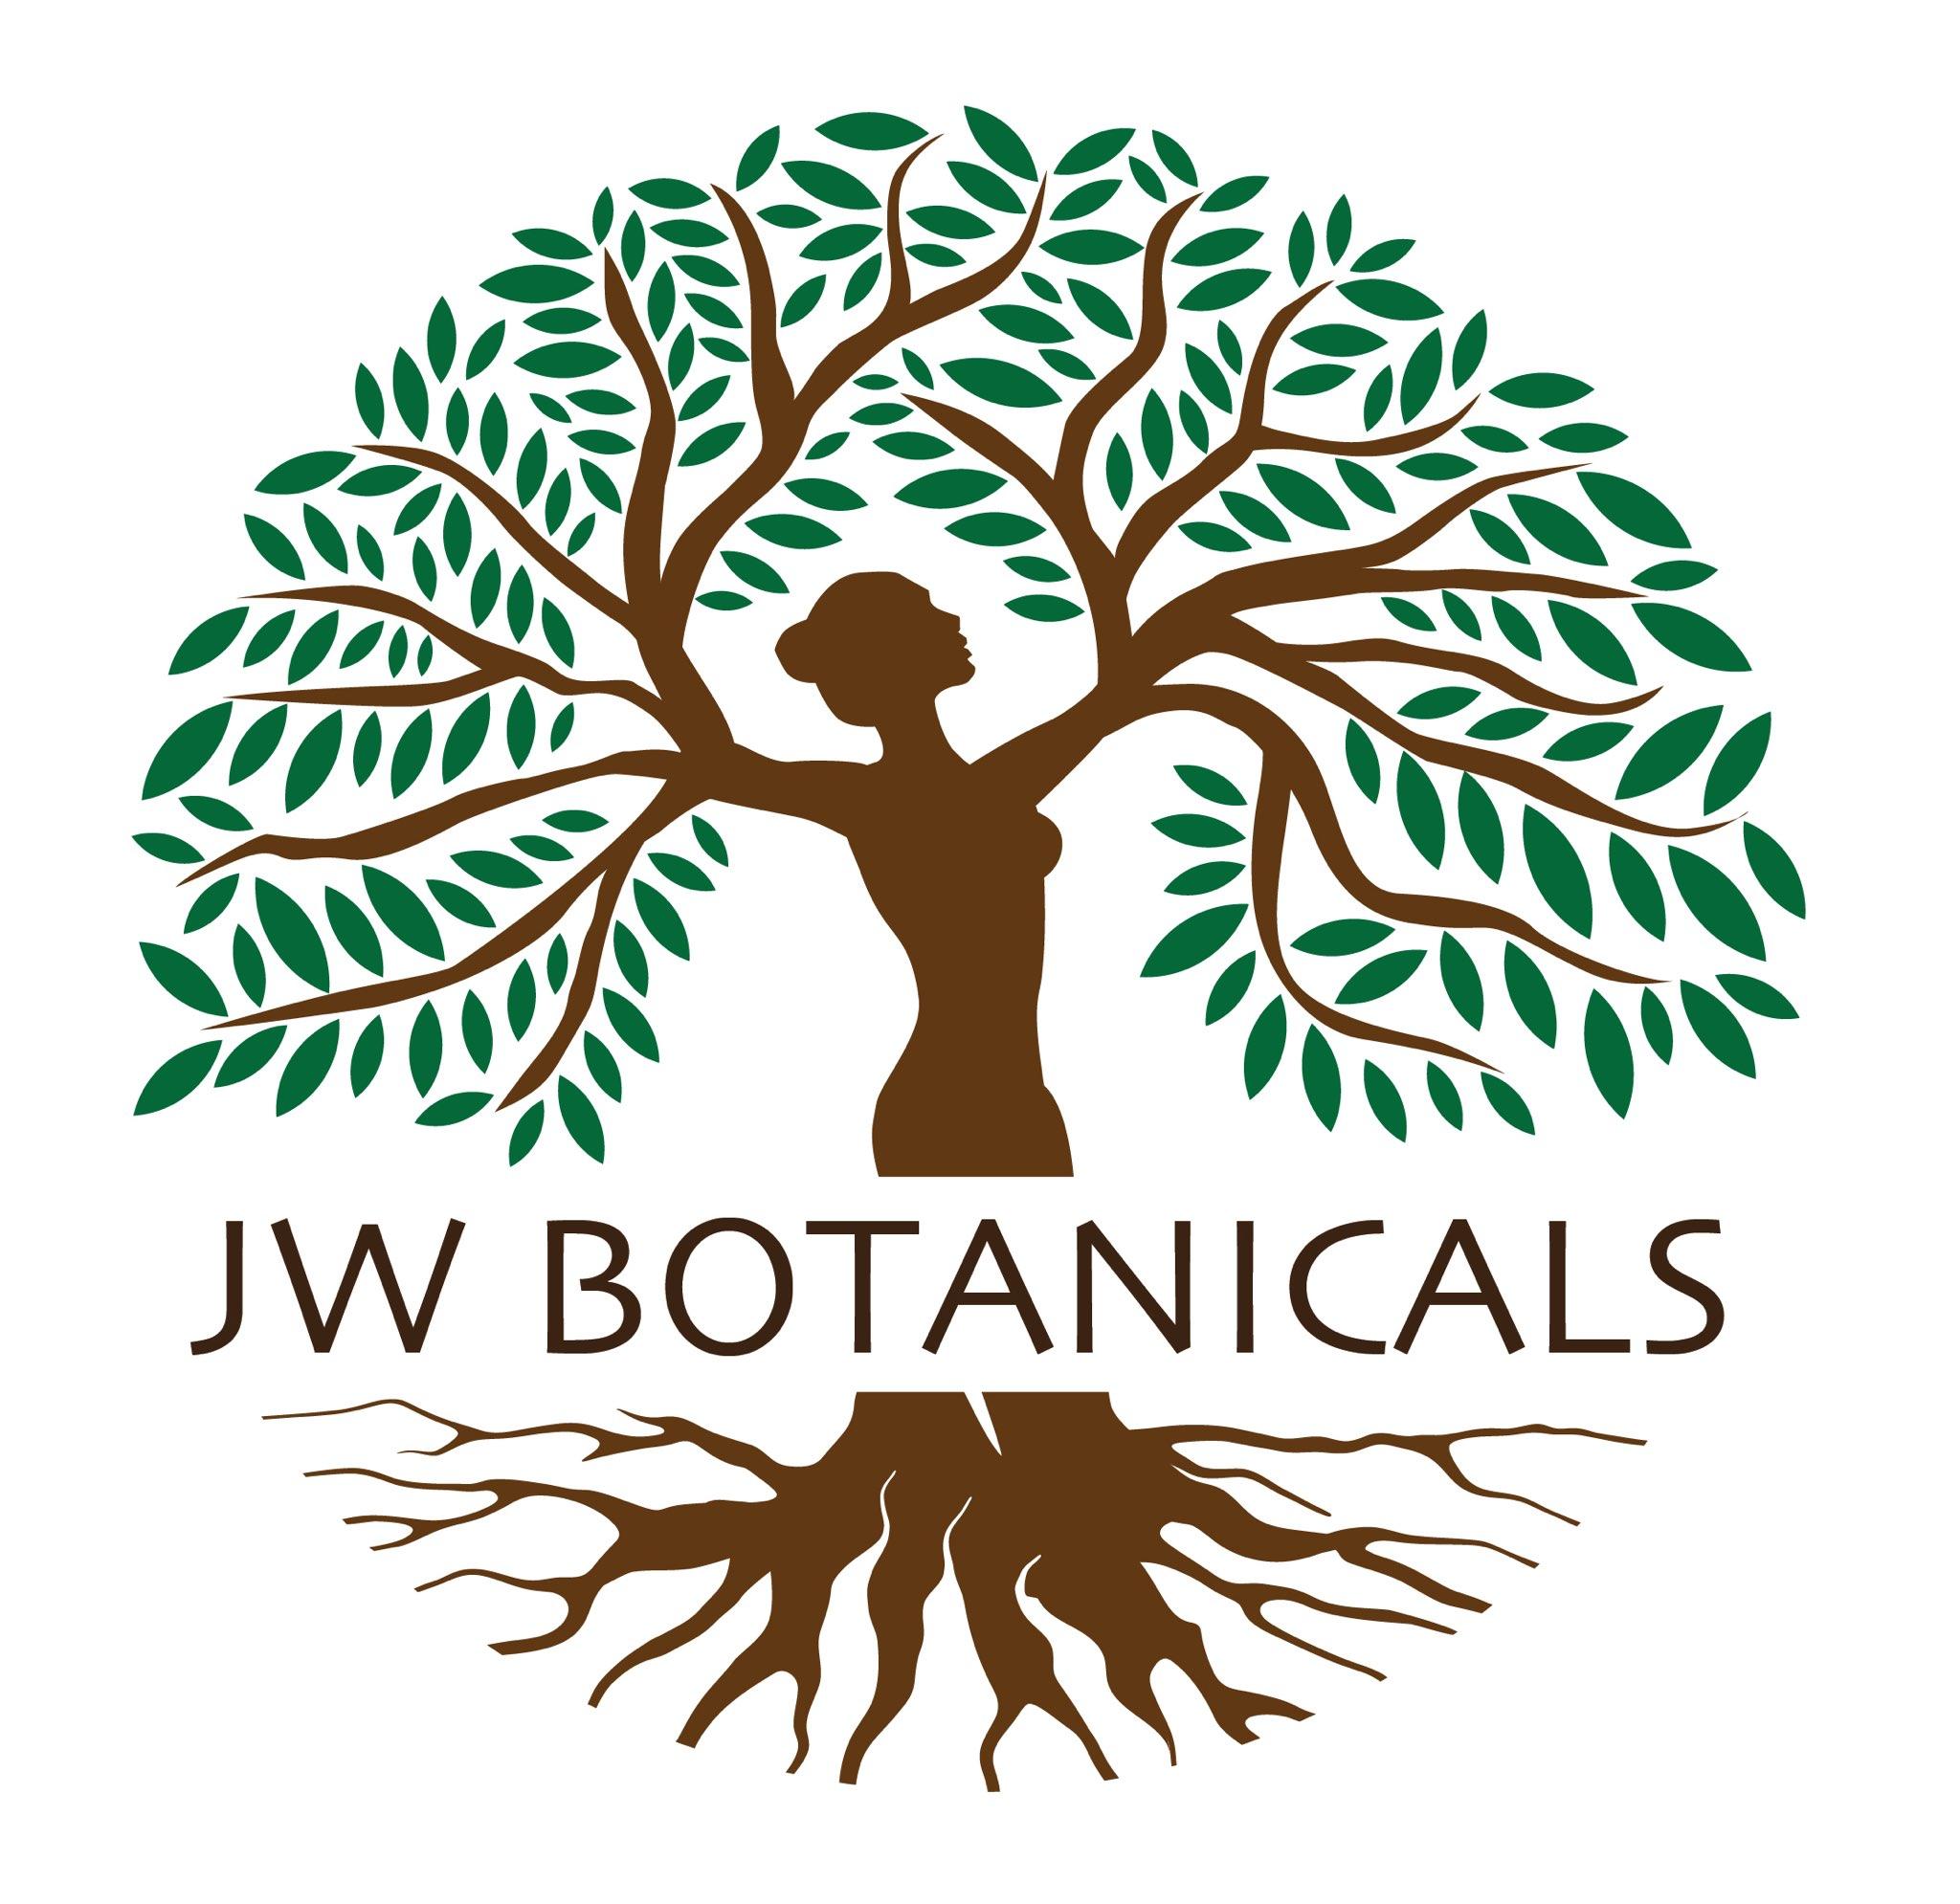 JW Botanicals